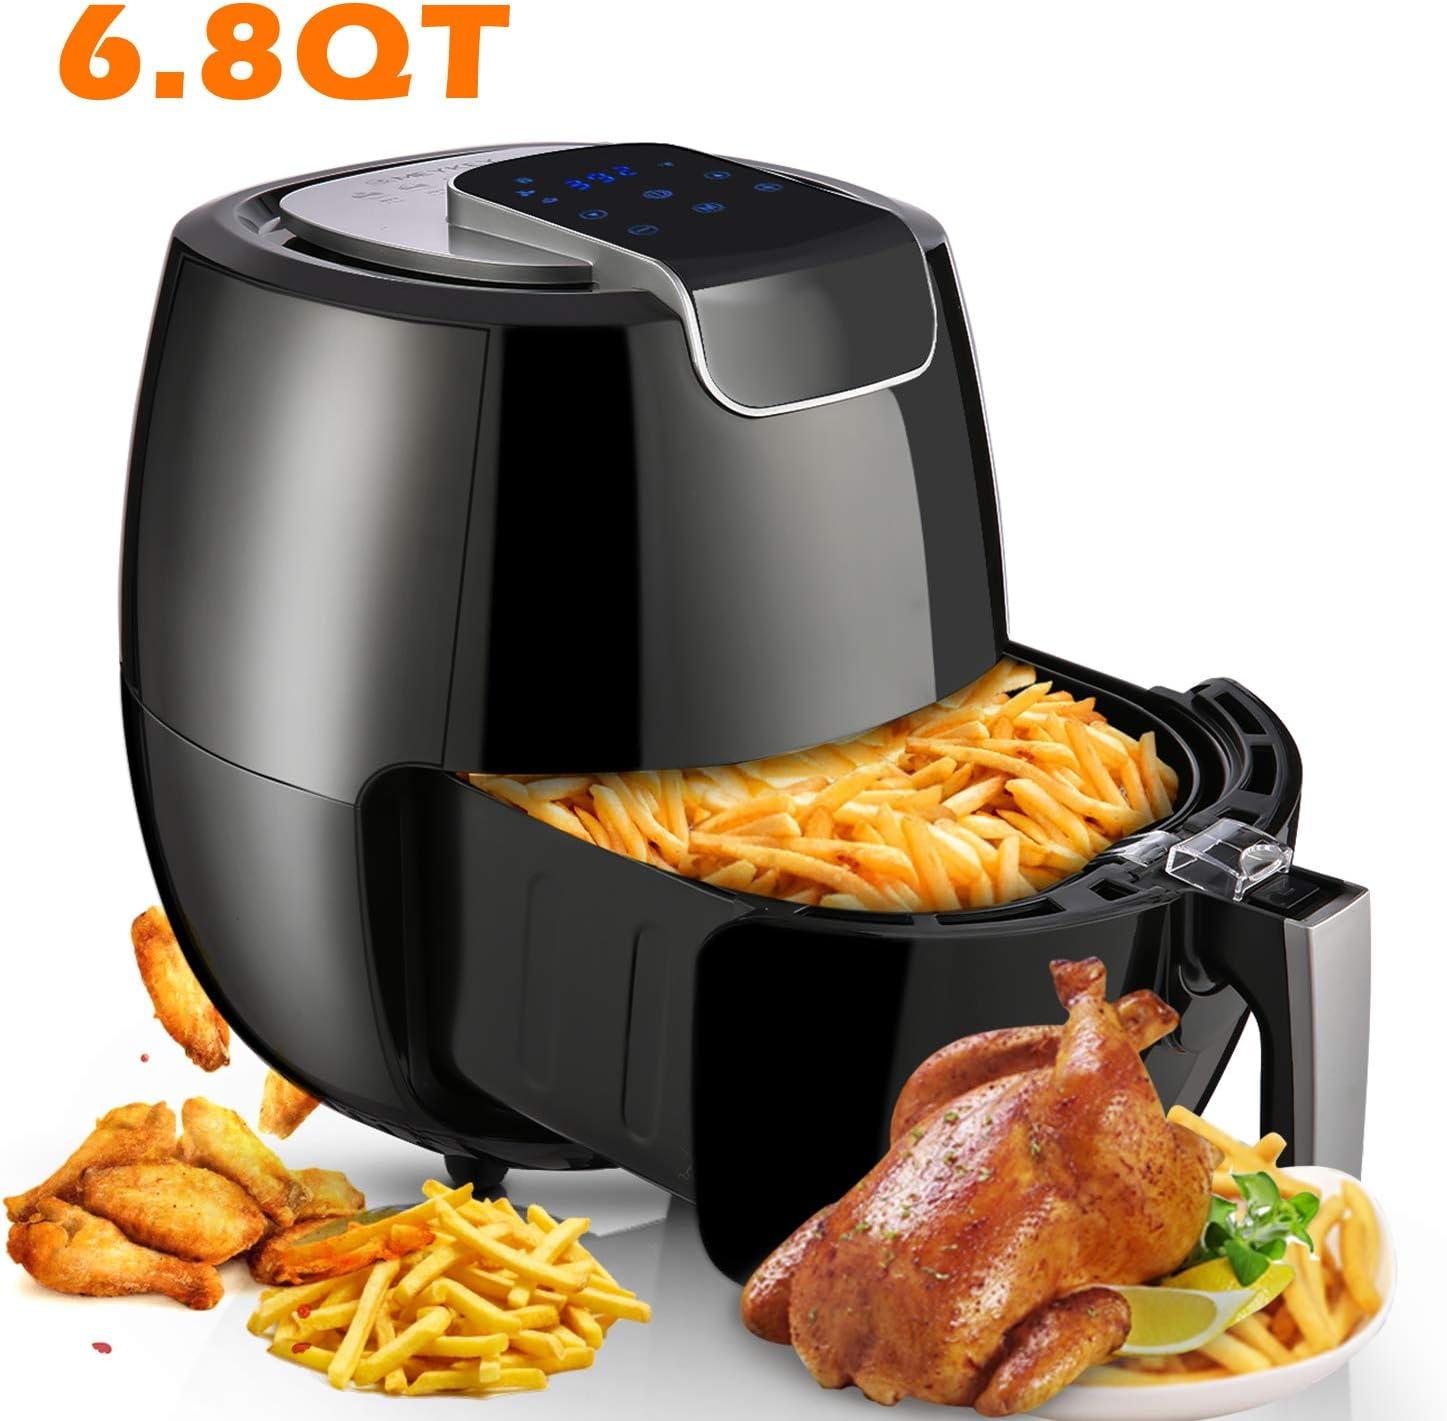 Air Fryer XL 6.8QT, 1800W Air Cooker Electric Hot Air Fryers Oven Oilless Cooker with LCD Digital Touchscreen